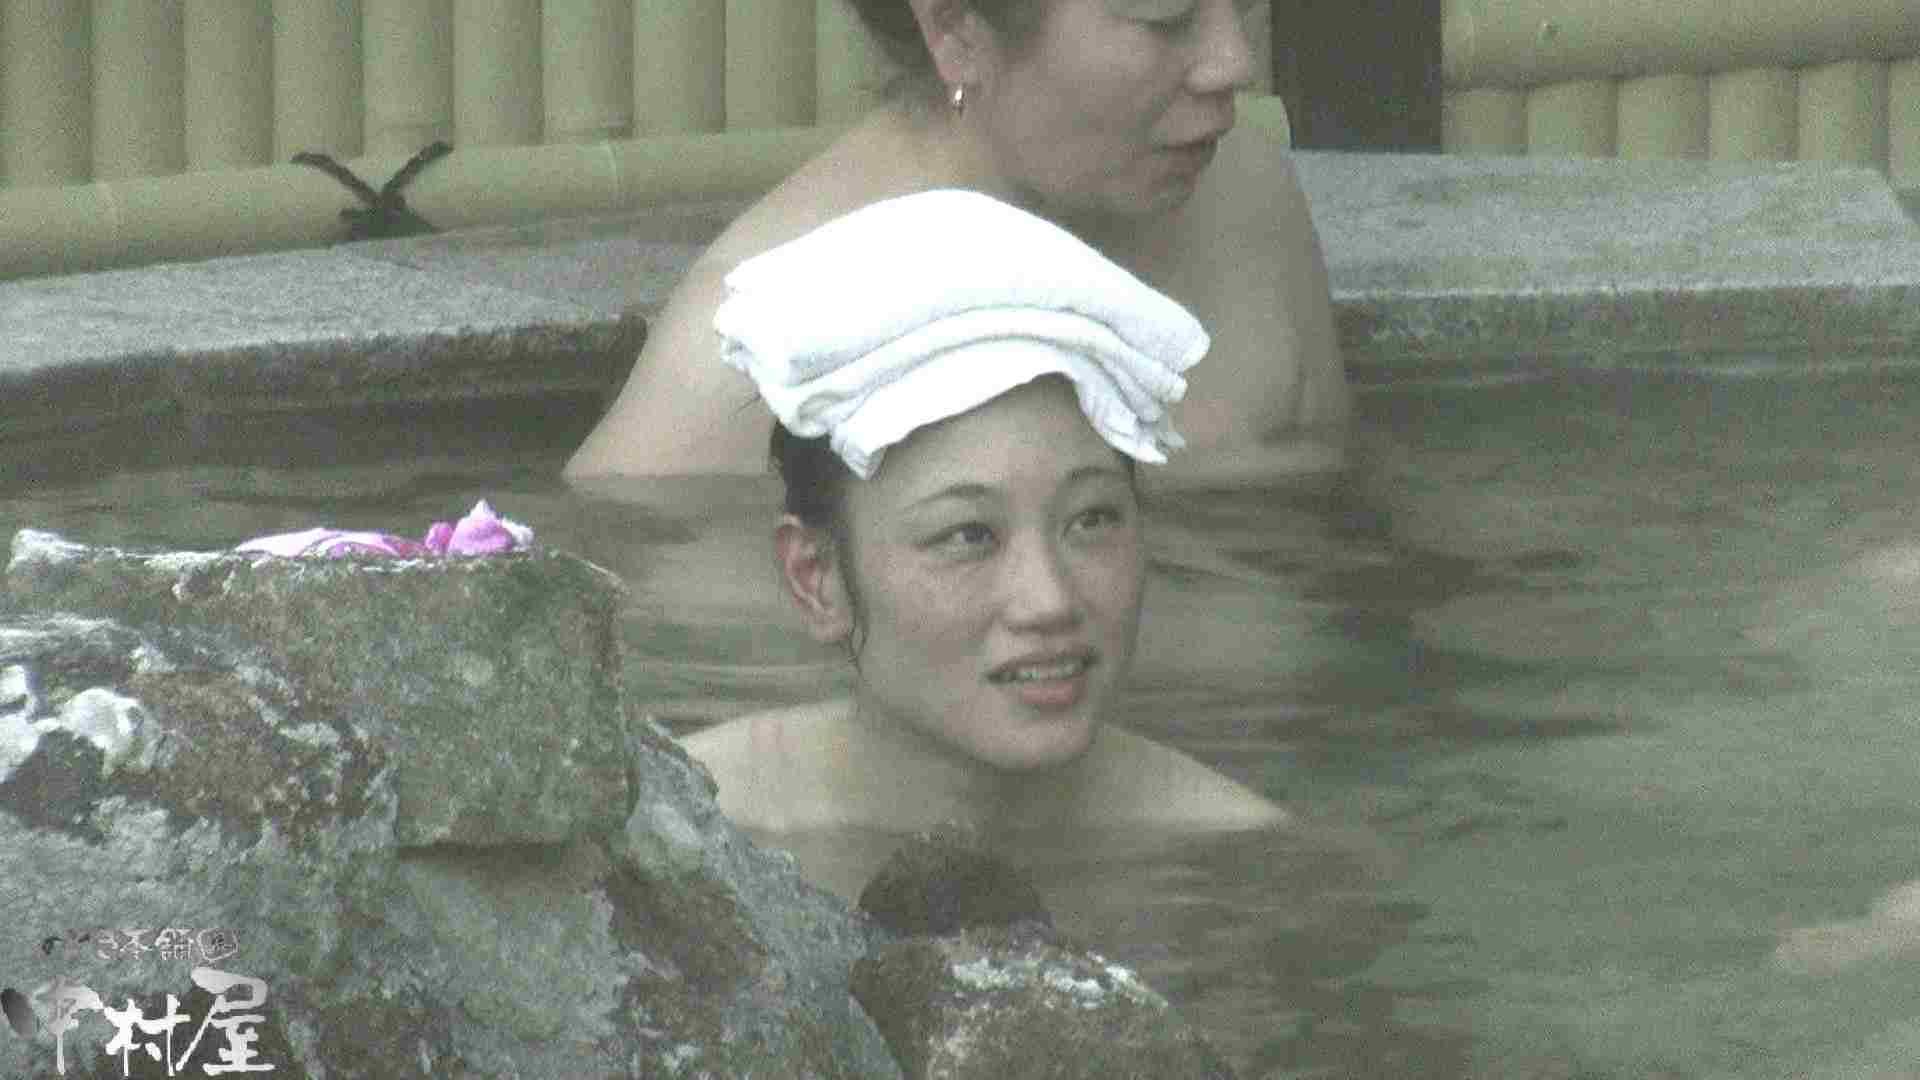 Aquaな露天風呂Vol.914 露天風呂編  83PIX 22